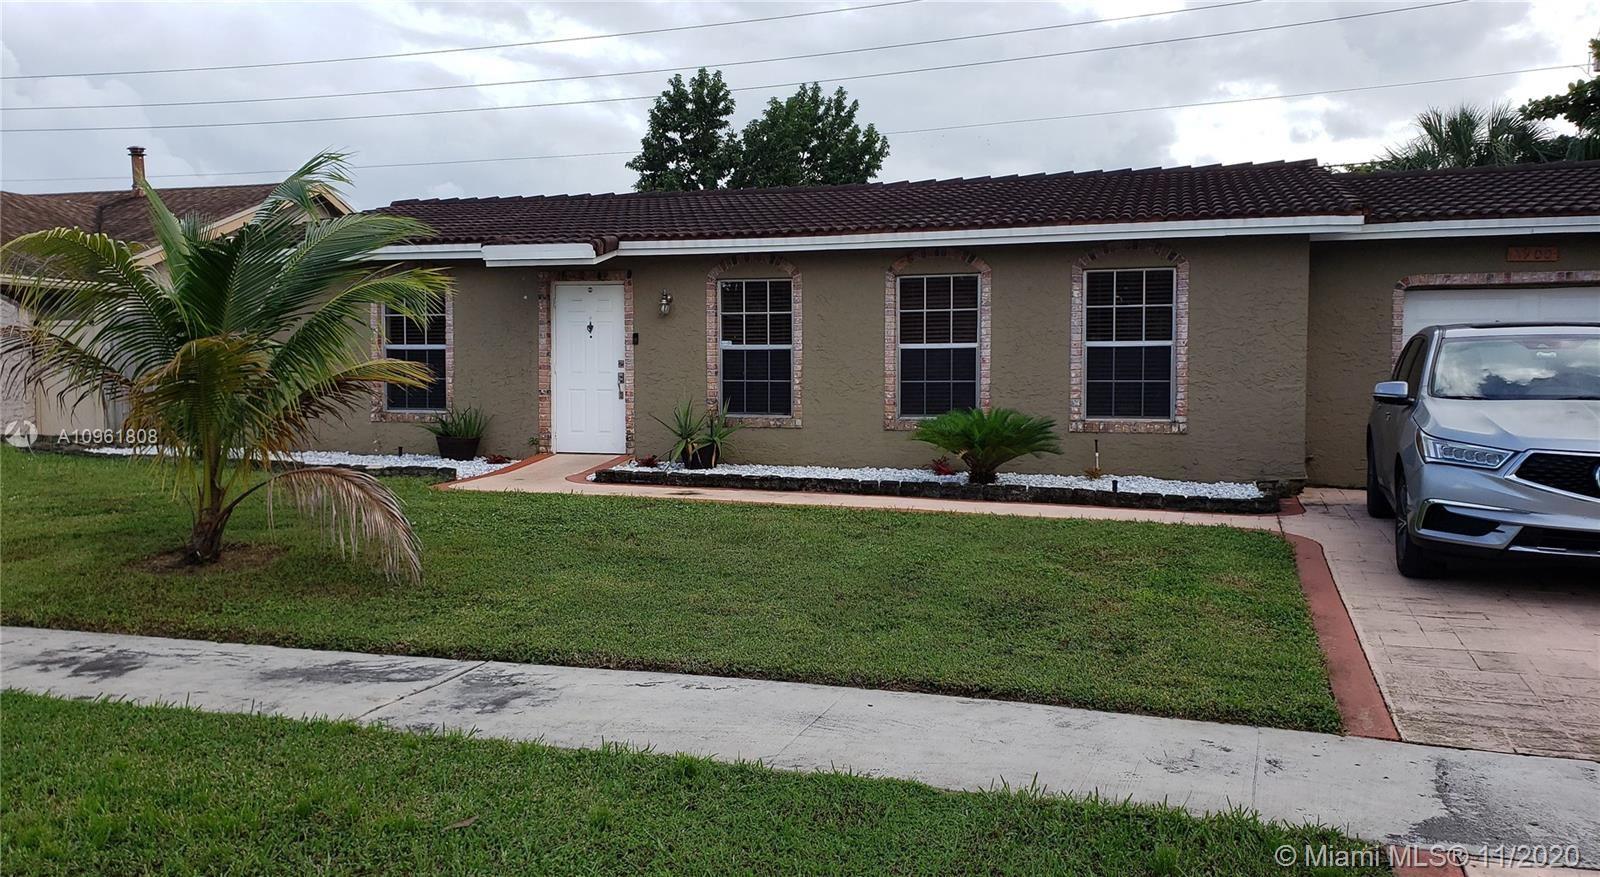 Photo of 7900 NW 44th Ct, Lauderhill, FL 33351 (MLS # A10961808)